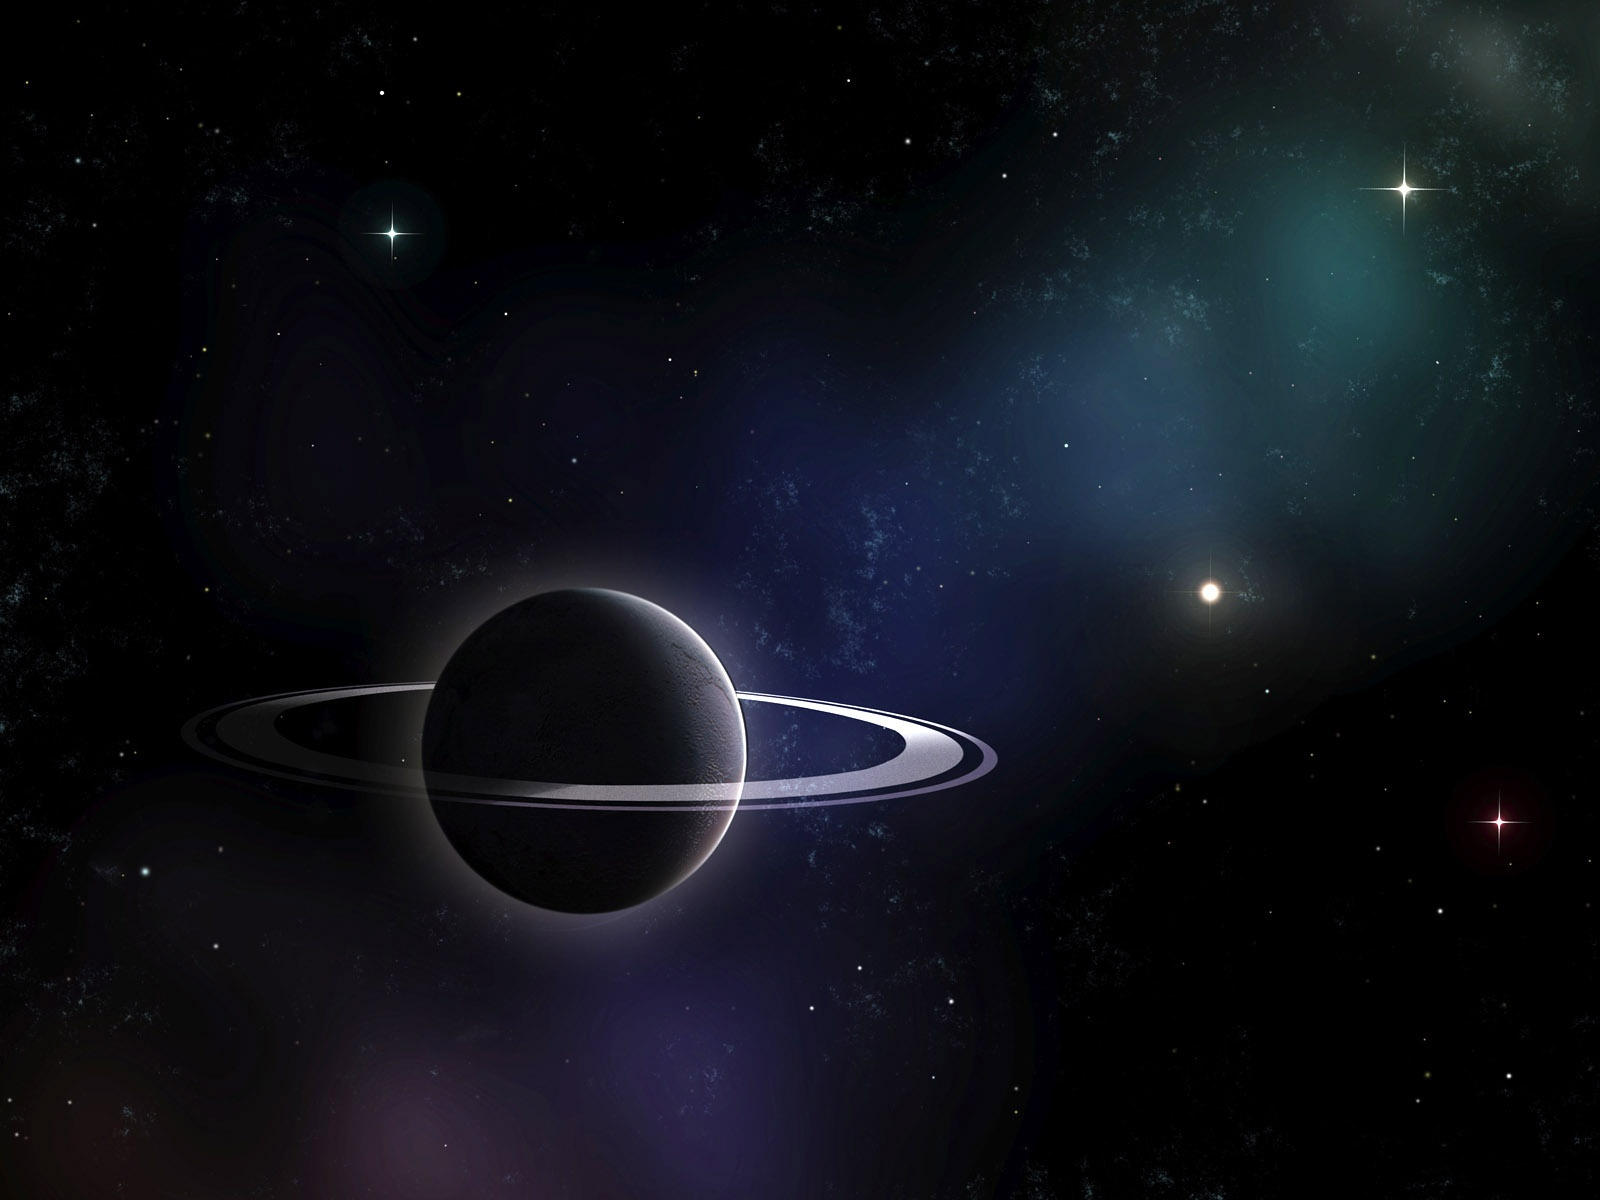 16 Luxury Pubg Wallpaper Iphone 6: Planeten Achtergronden